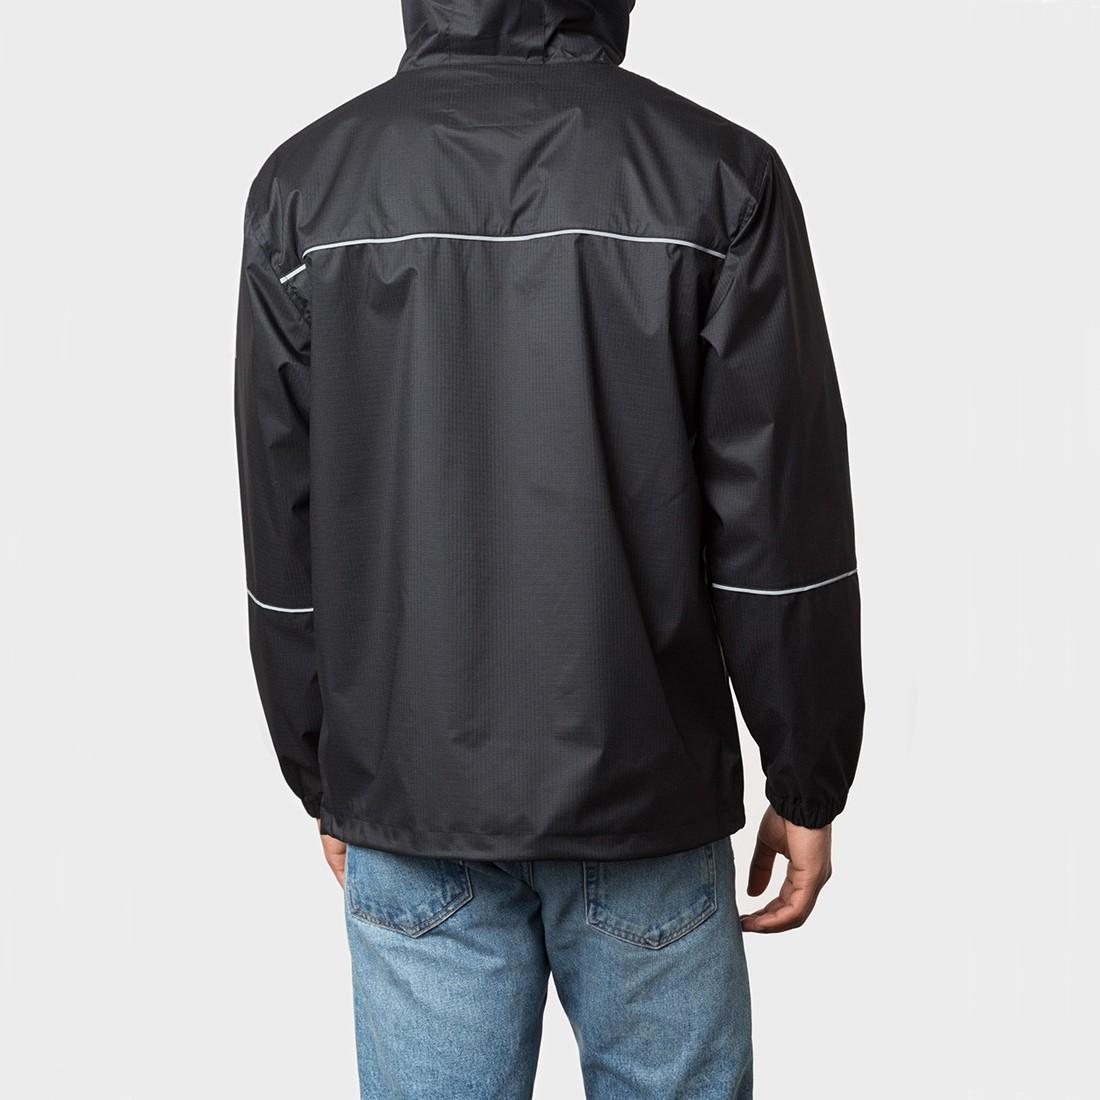 6f593f16f Online Stüssy men's clothing - 3M RipStop Jacket Black